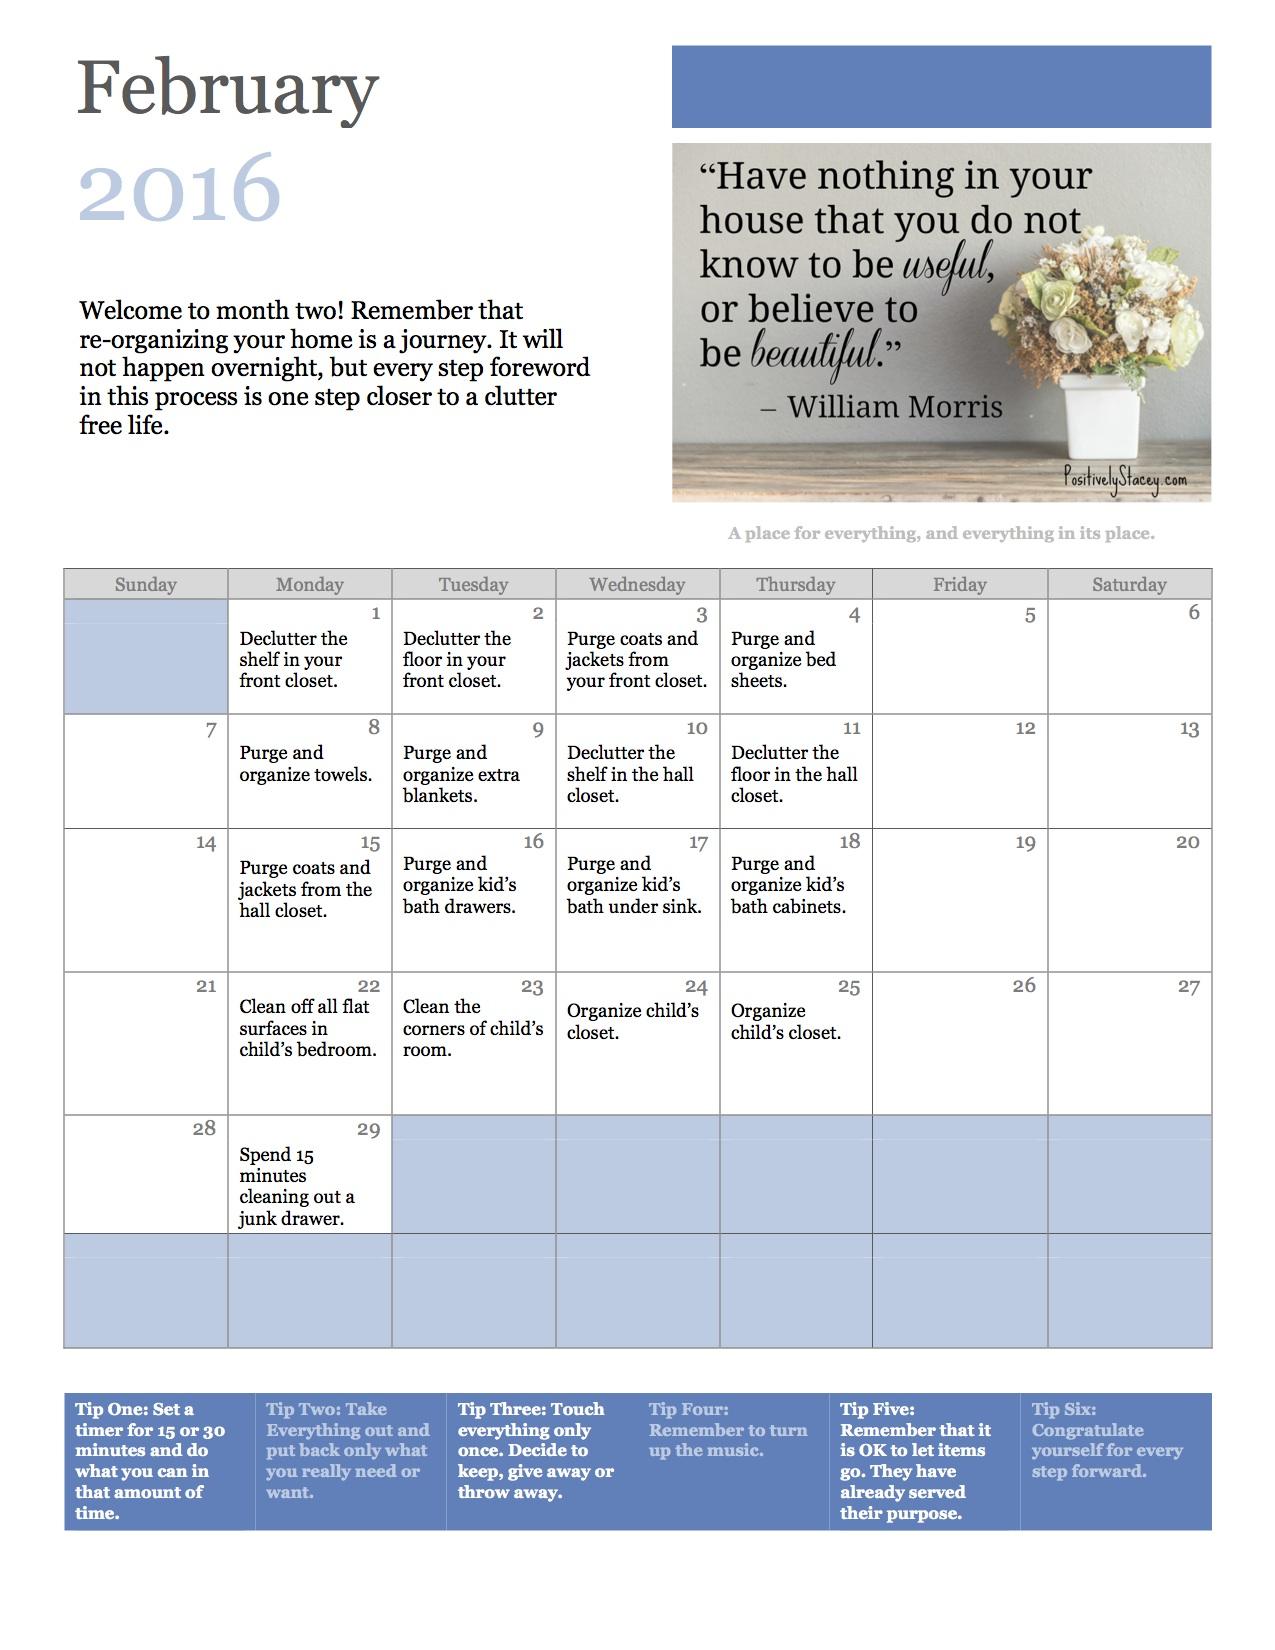 February Home Organization Plan copy